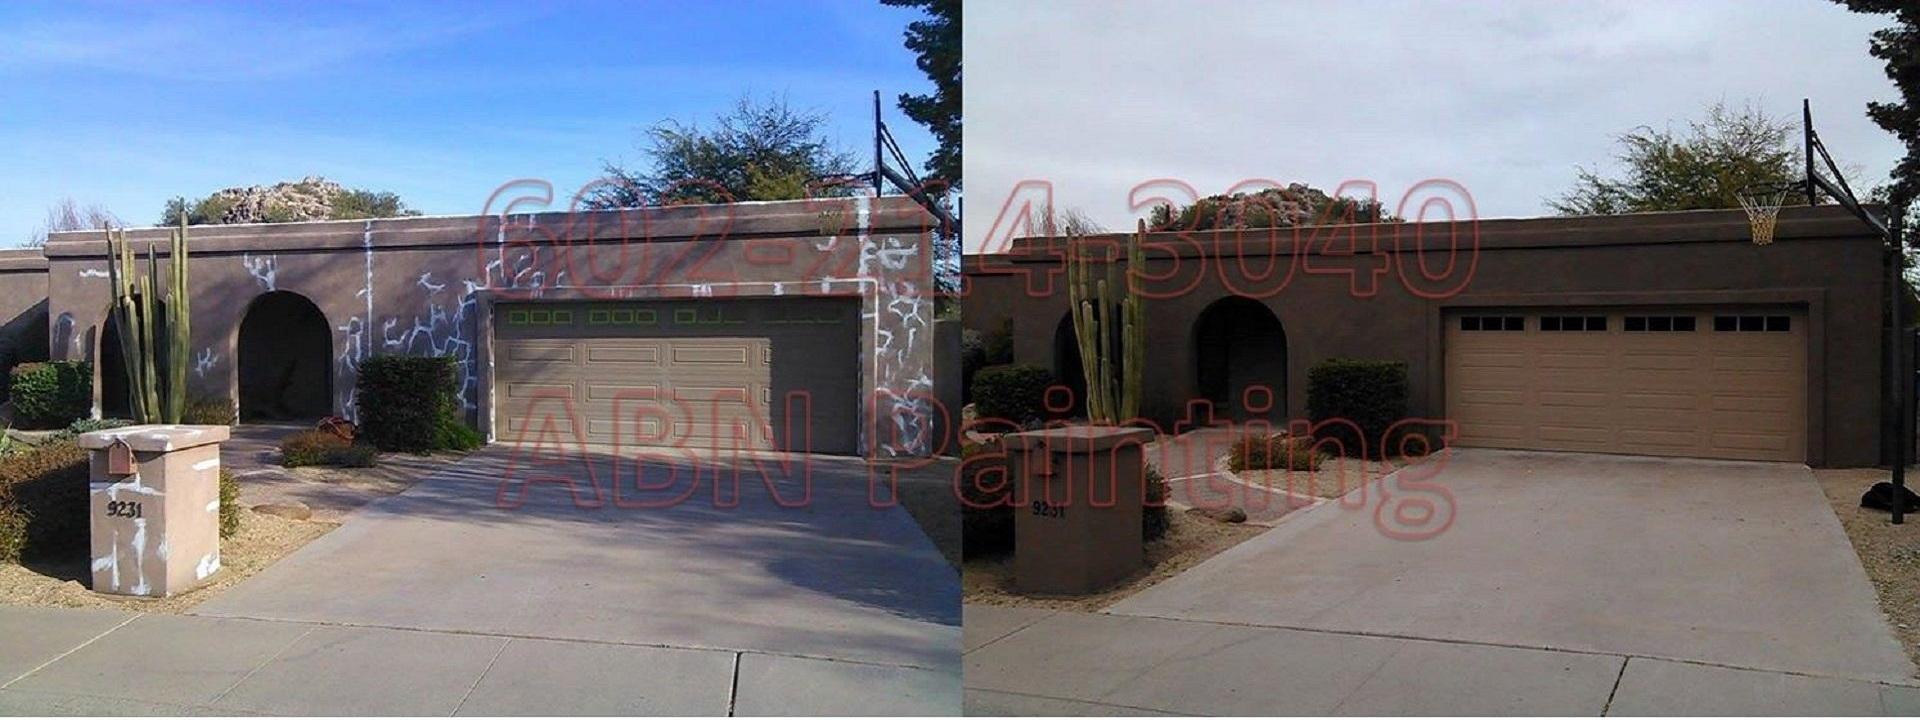 House Painting Phoenix Az Mafiamedia